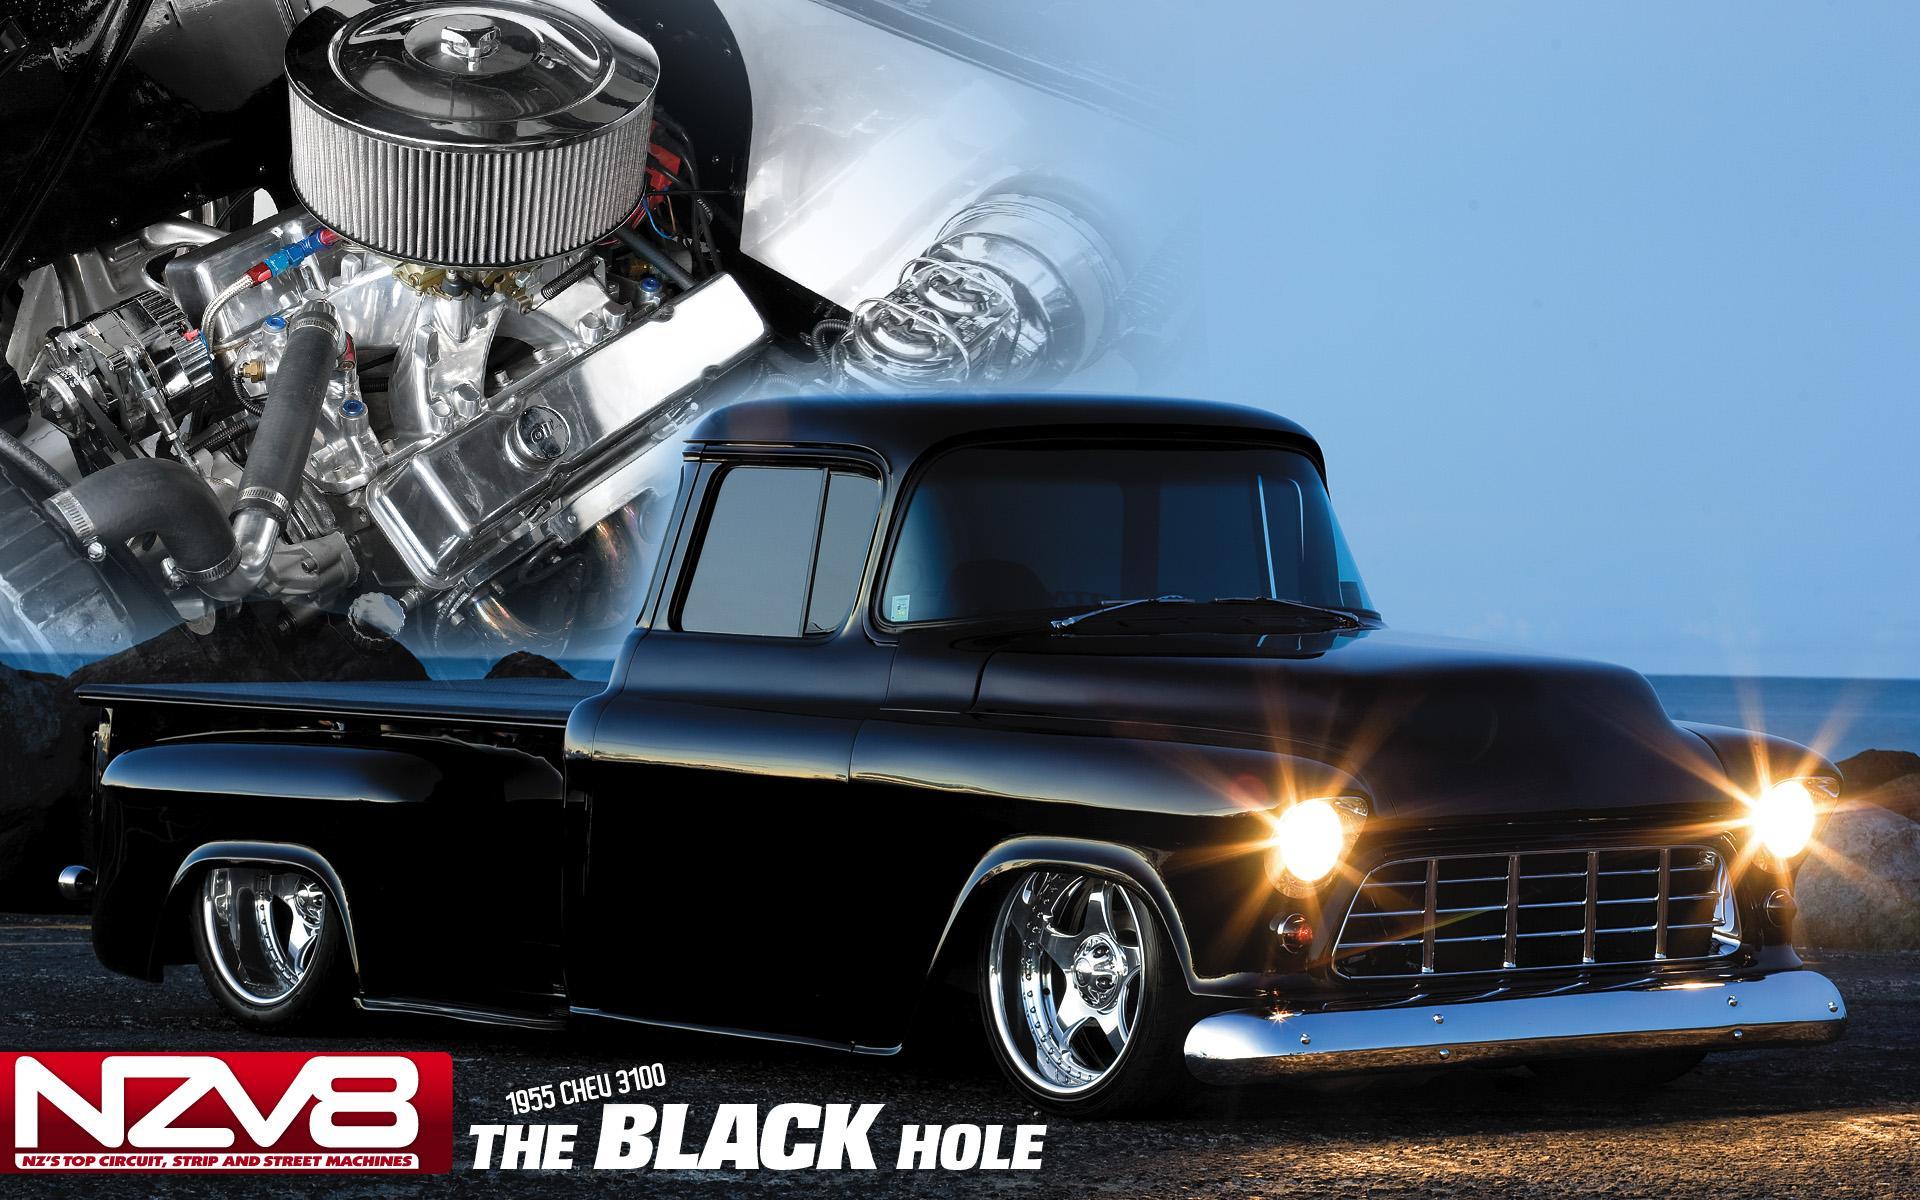 Lowrider Cars Wallpapers   Desktop Backgrounds 1920x1200